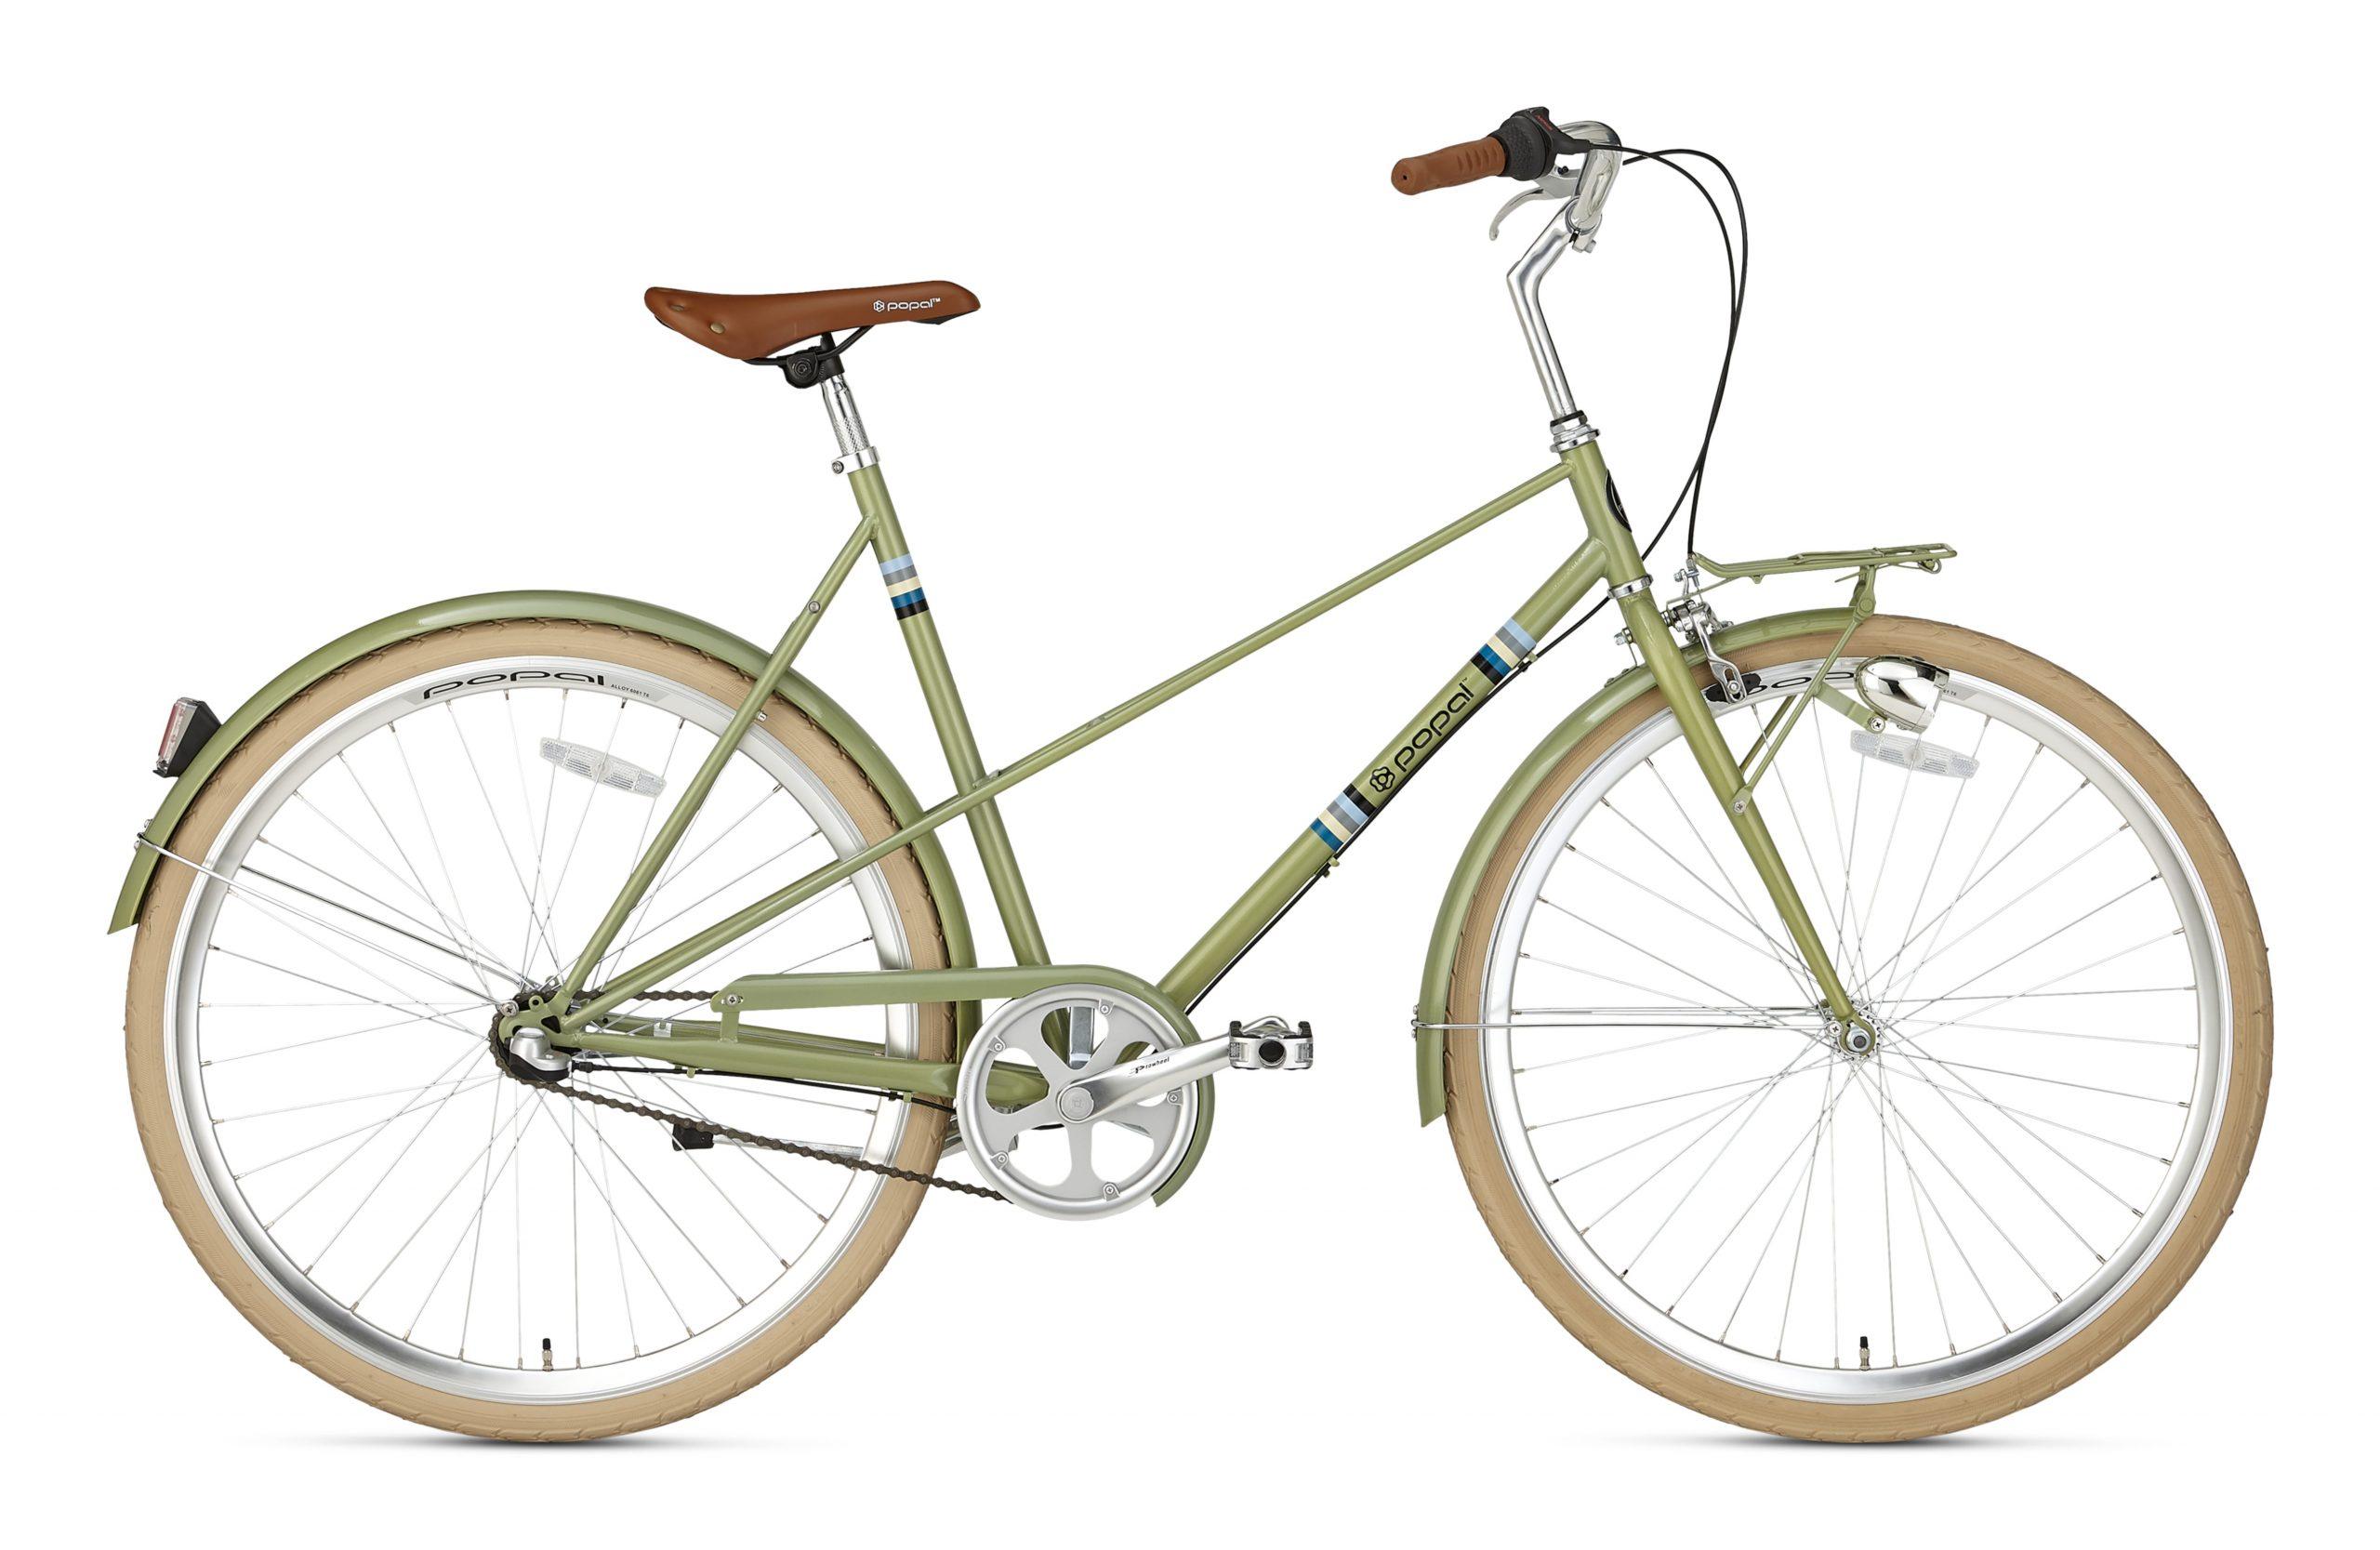 Capri N3 - 2019 - Olive Green - 28 inch / 57 cm